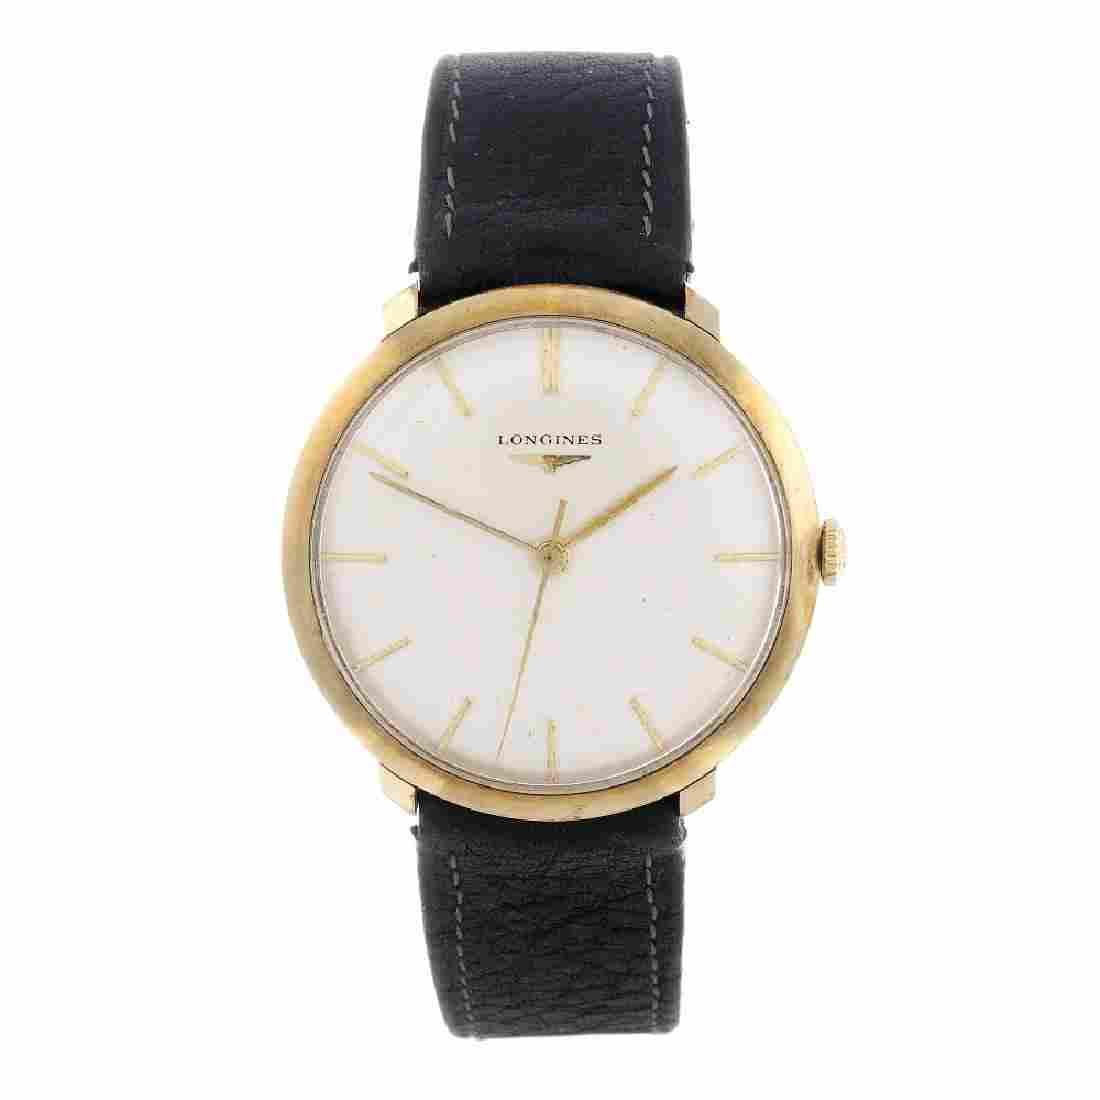 LONGINES - a gentleman's wrist watch. Yellow metal case